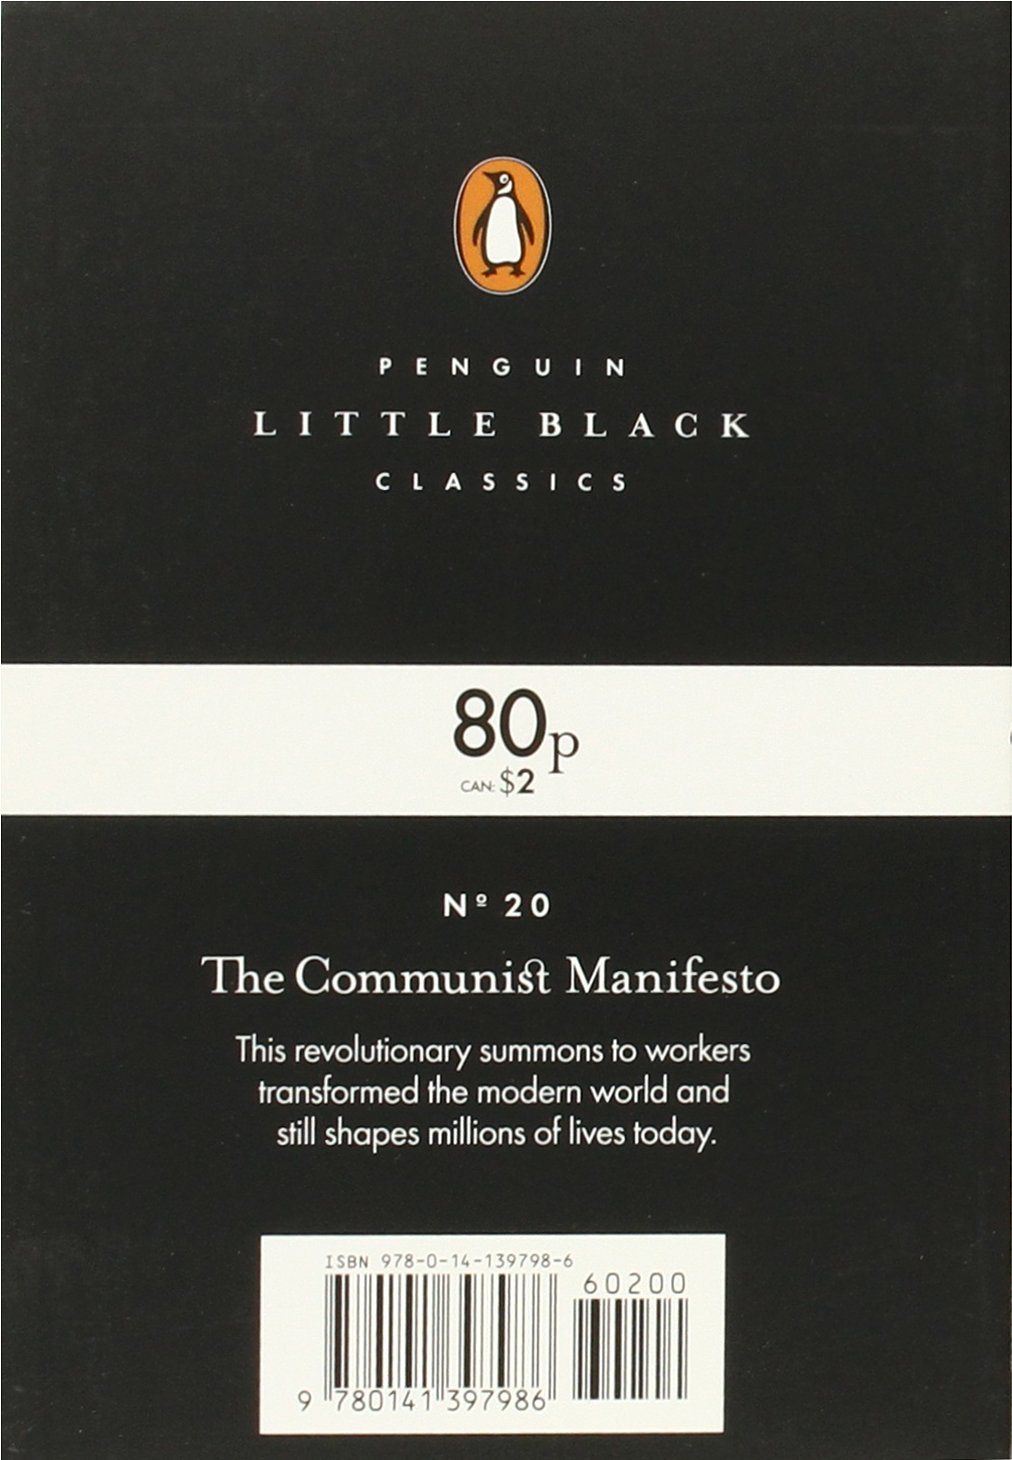 buy the communist manifesto penguin little black classics book buy the communist manifesto penguin little black classics book online at low prices in the communist manifesto penguin little black classics